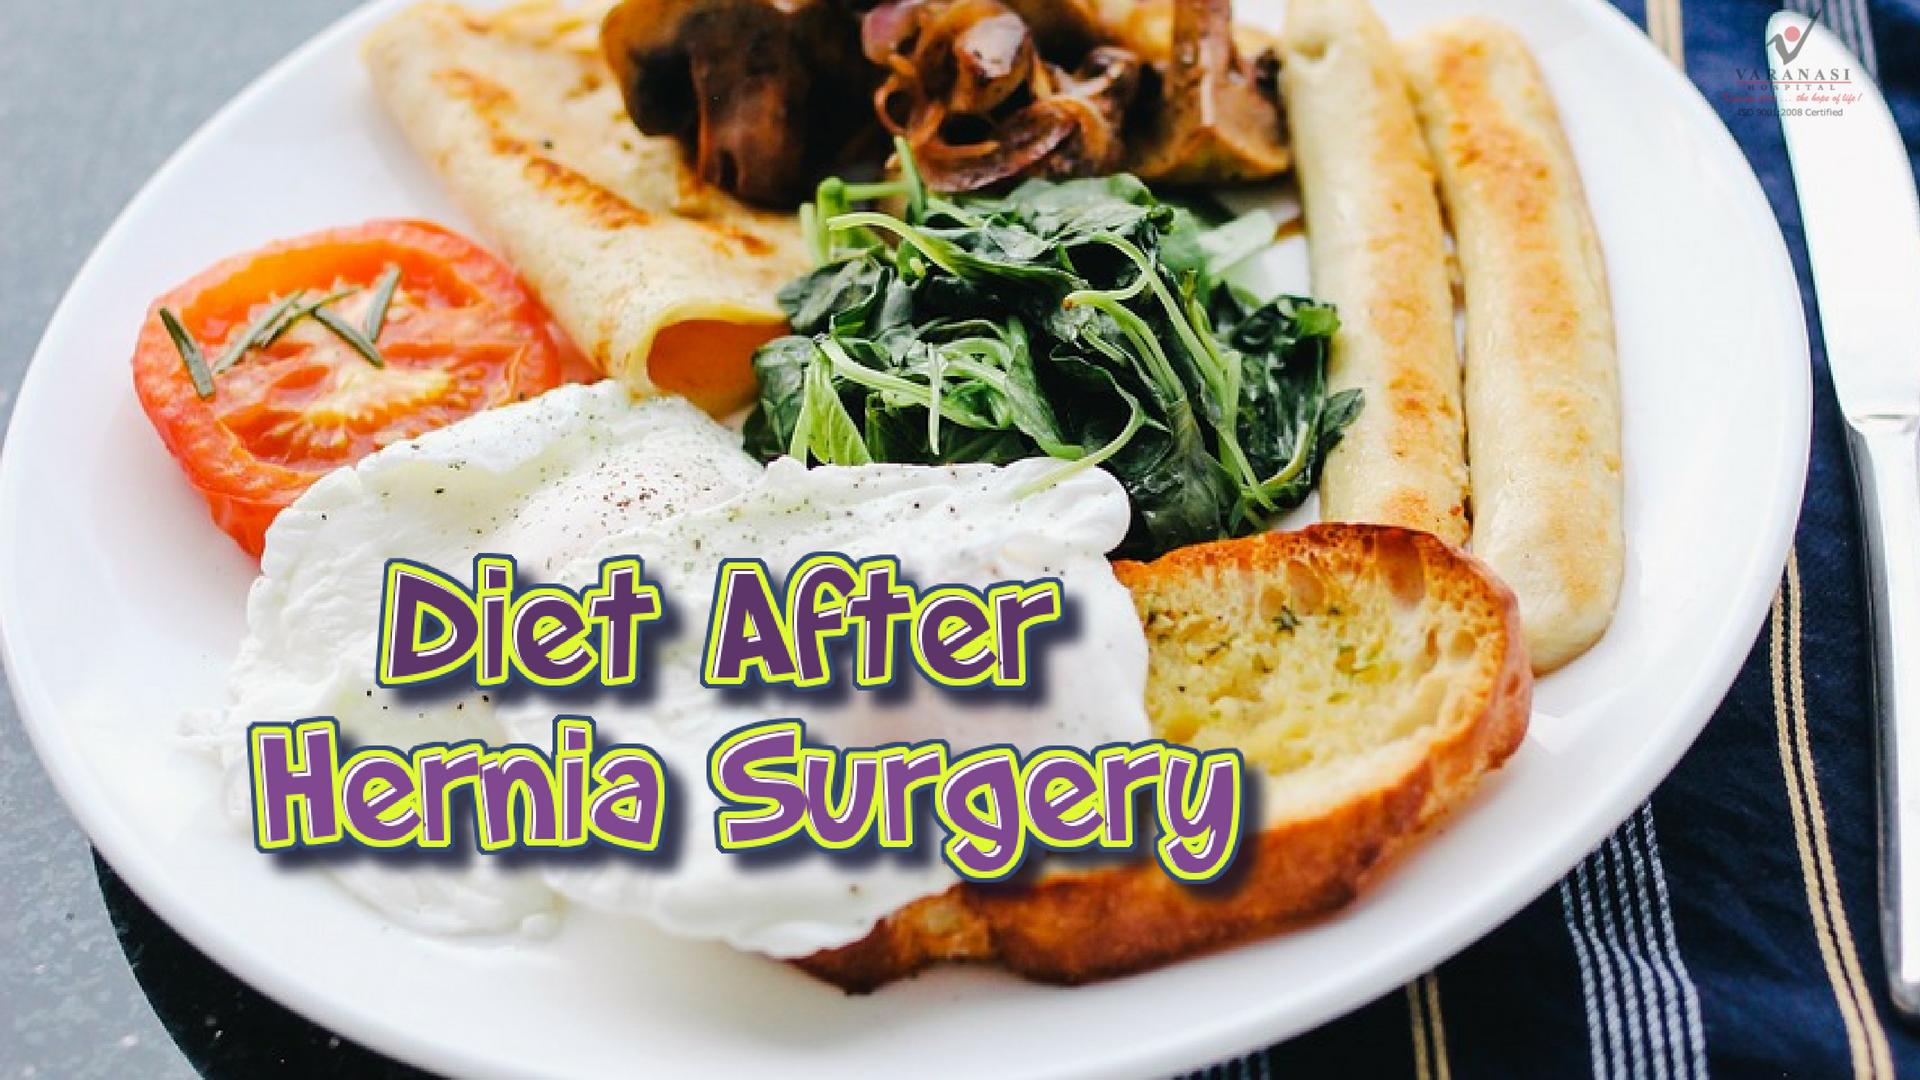 DIET AFTER HERNIA SURGERY